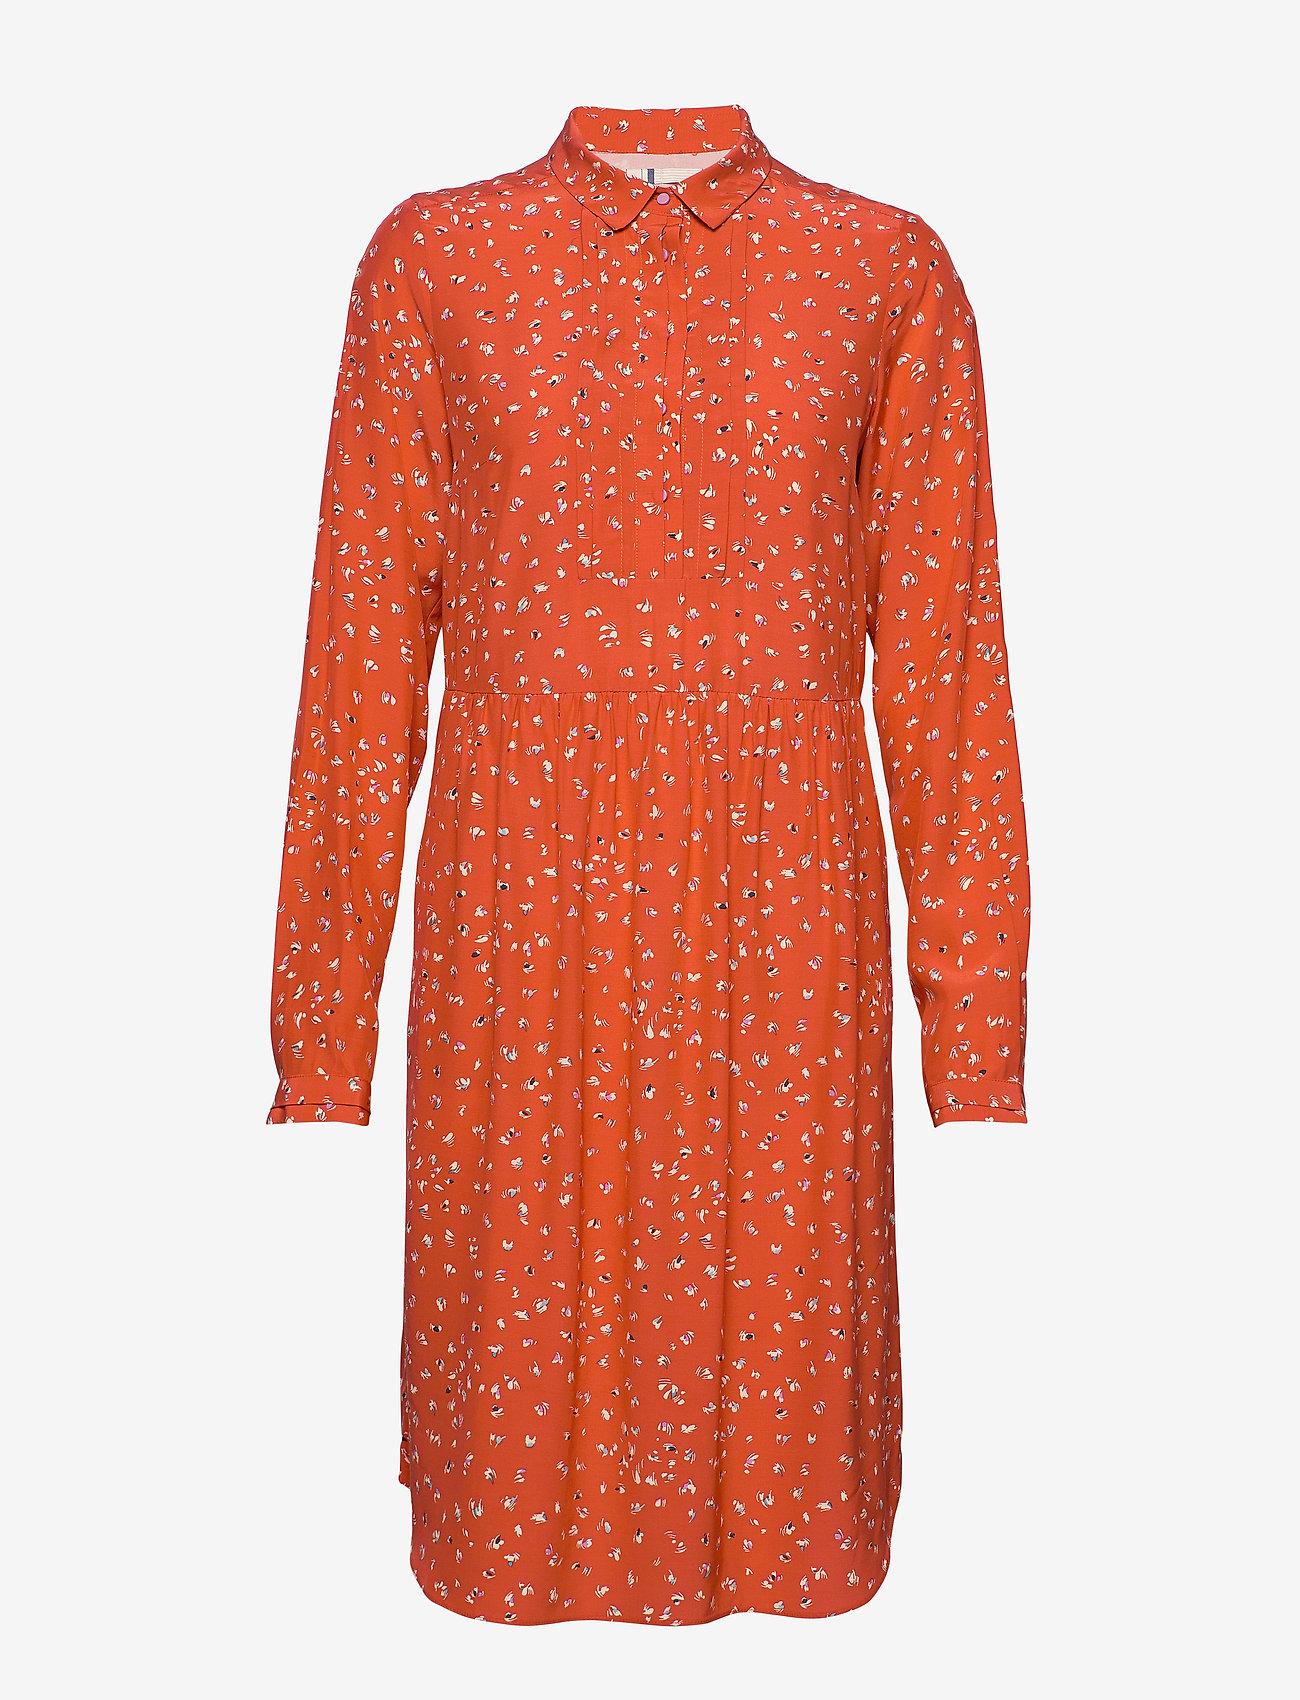 Noa Noa - Dress long sleeve - blousejurken - print red - 1